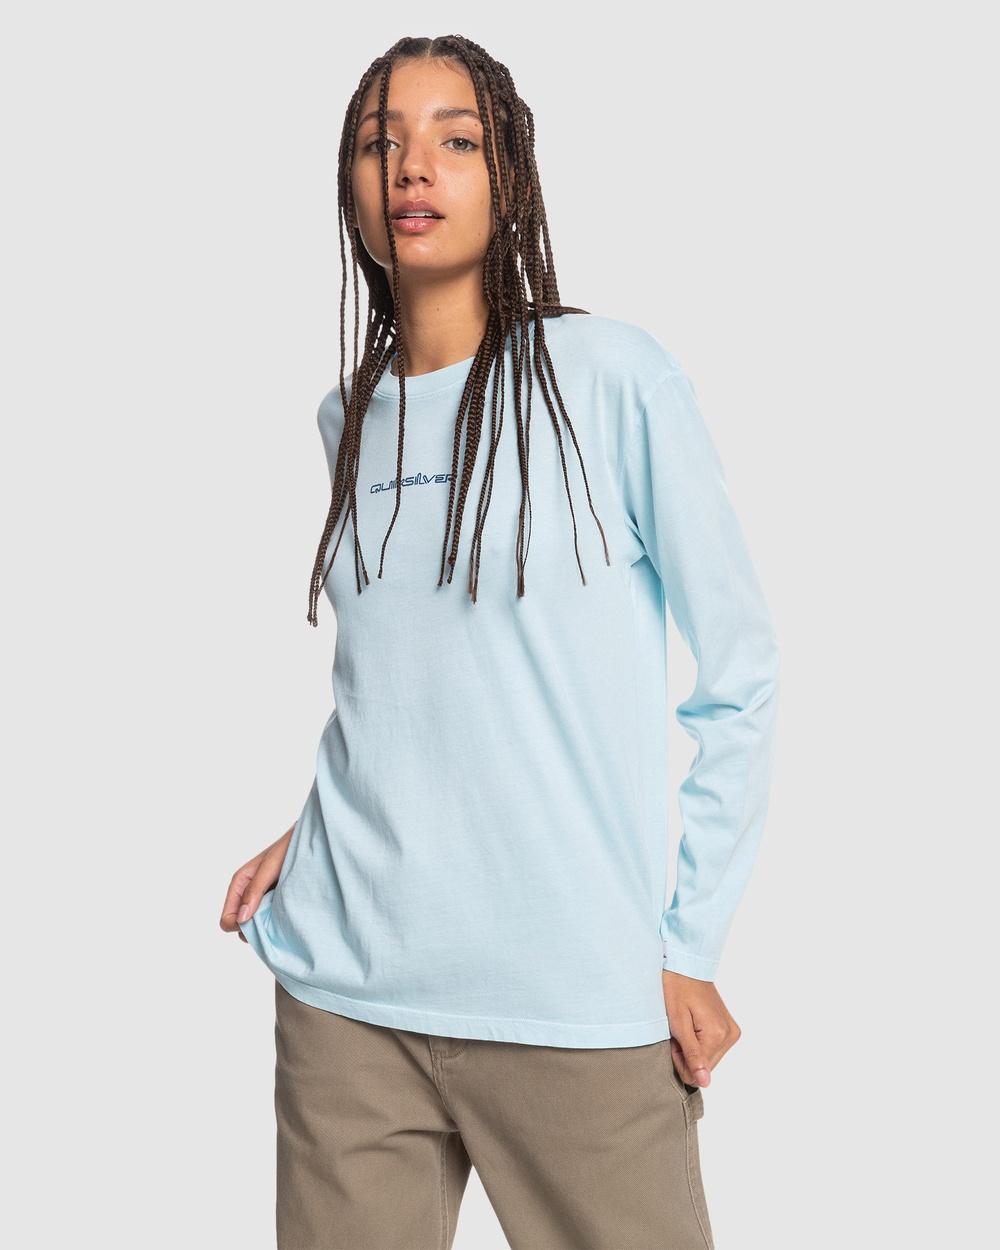 Quiksilver - Womens Standard Organic Long Sleeve T Shirt - Long Sleeve T-Shirts (CRYSTAL BLUE) Womens Standard Organic Long Sleeve T-Shirt